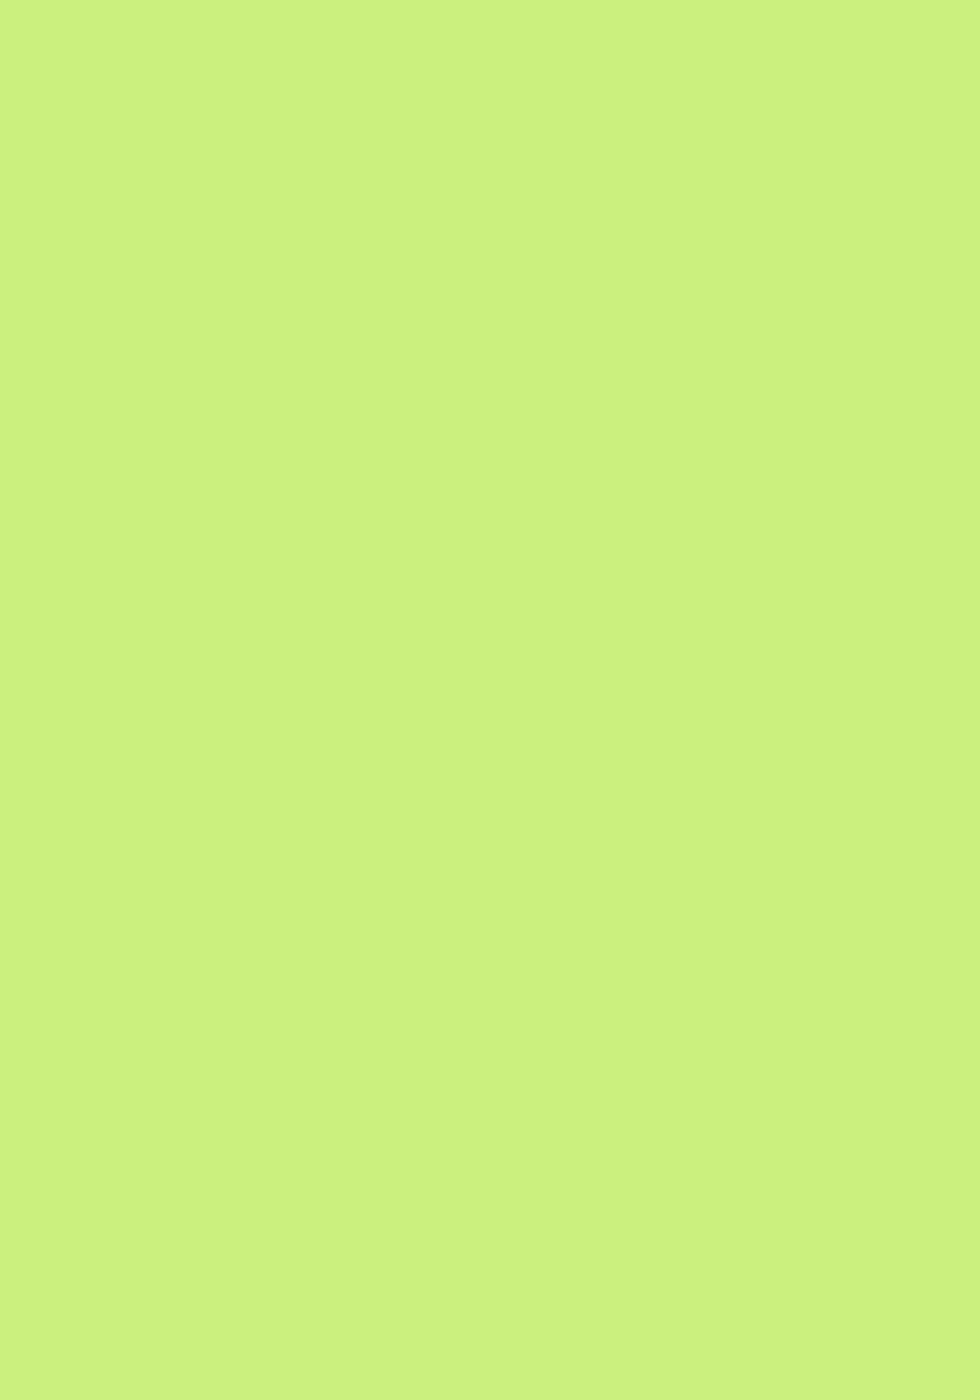 PUL pastellgrün 205